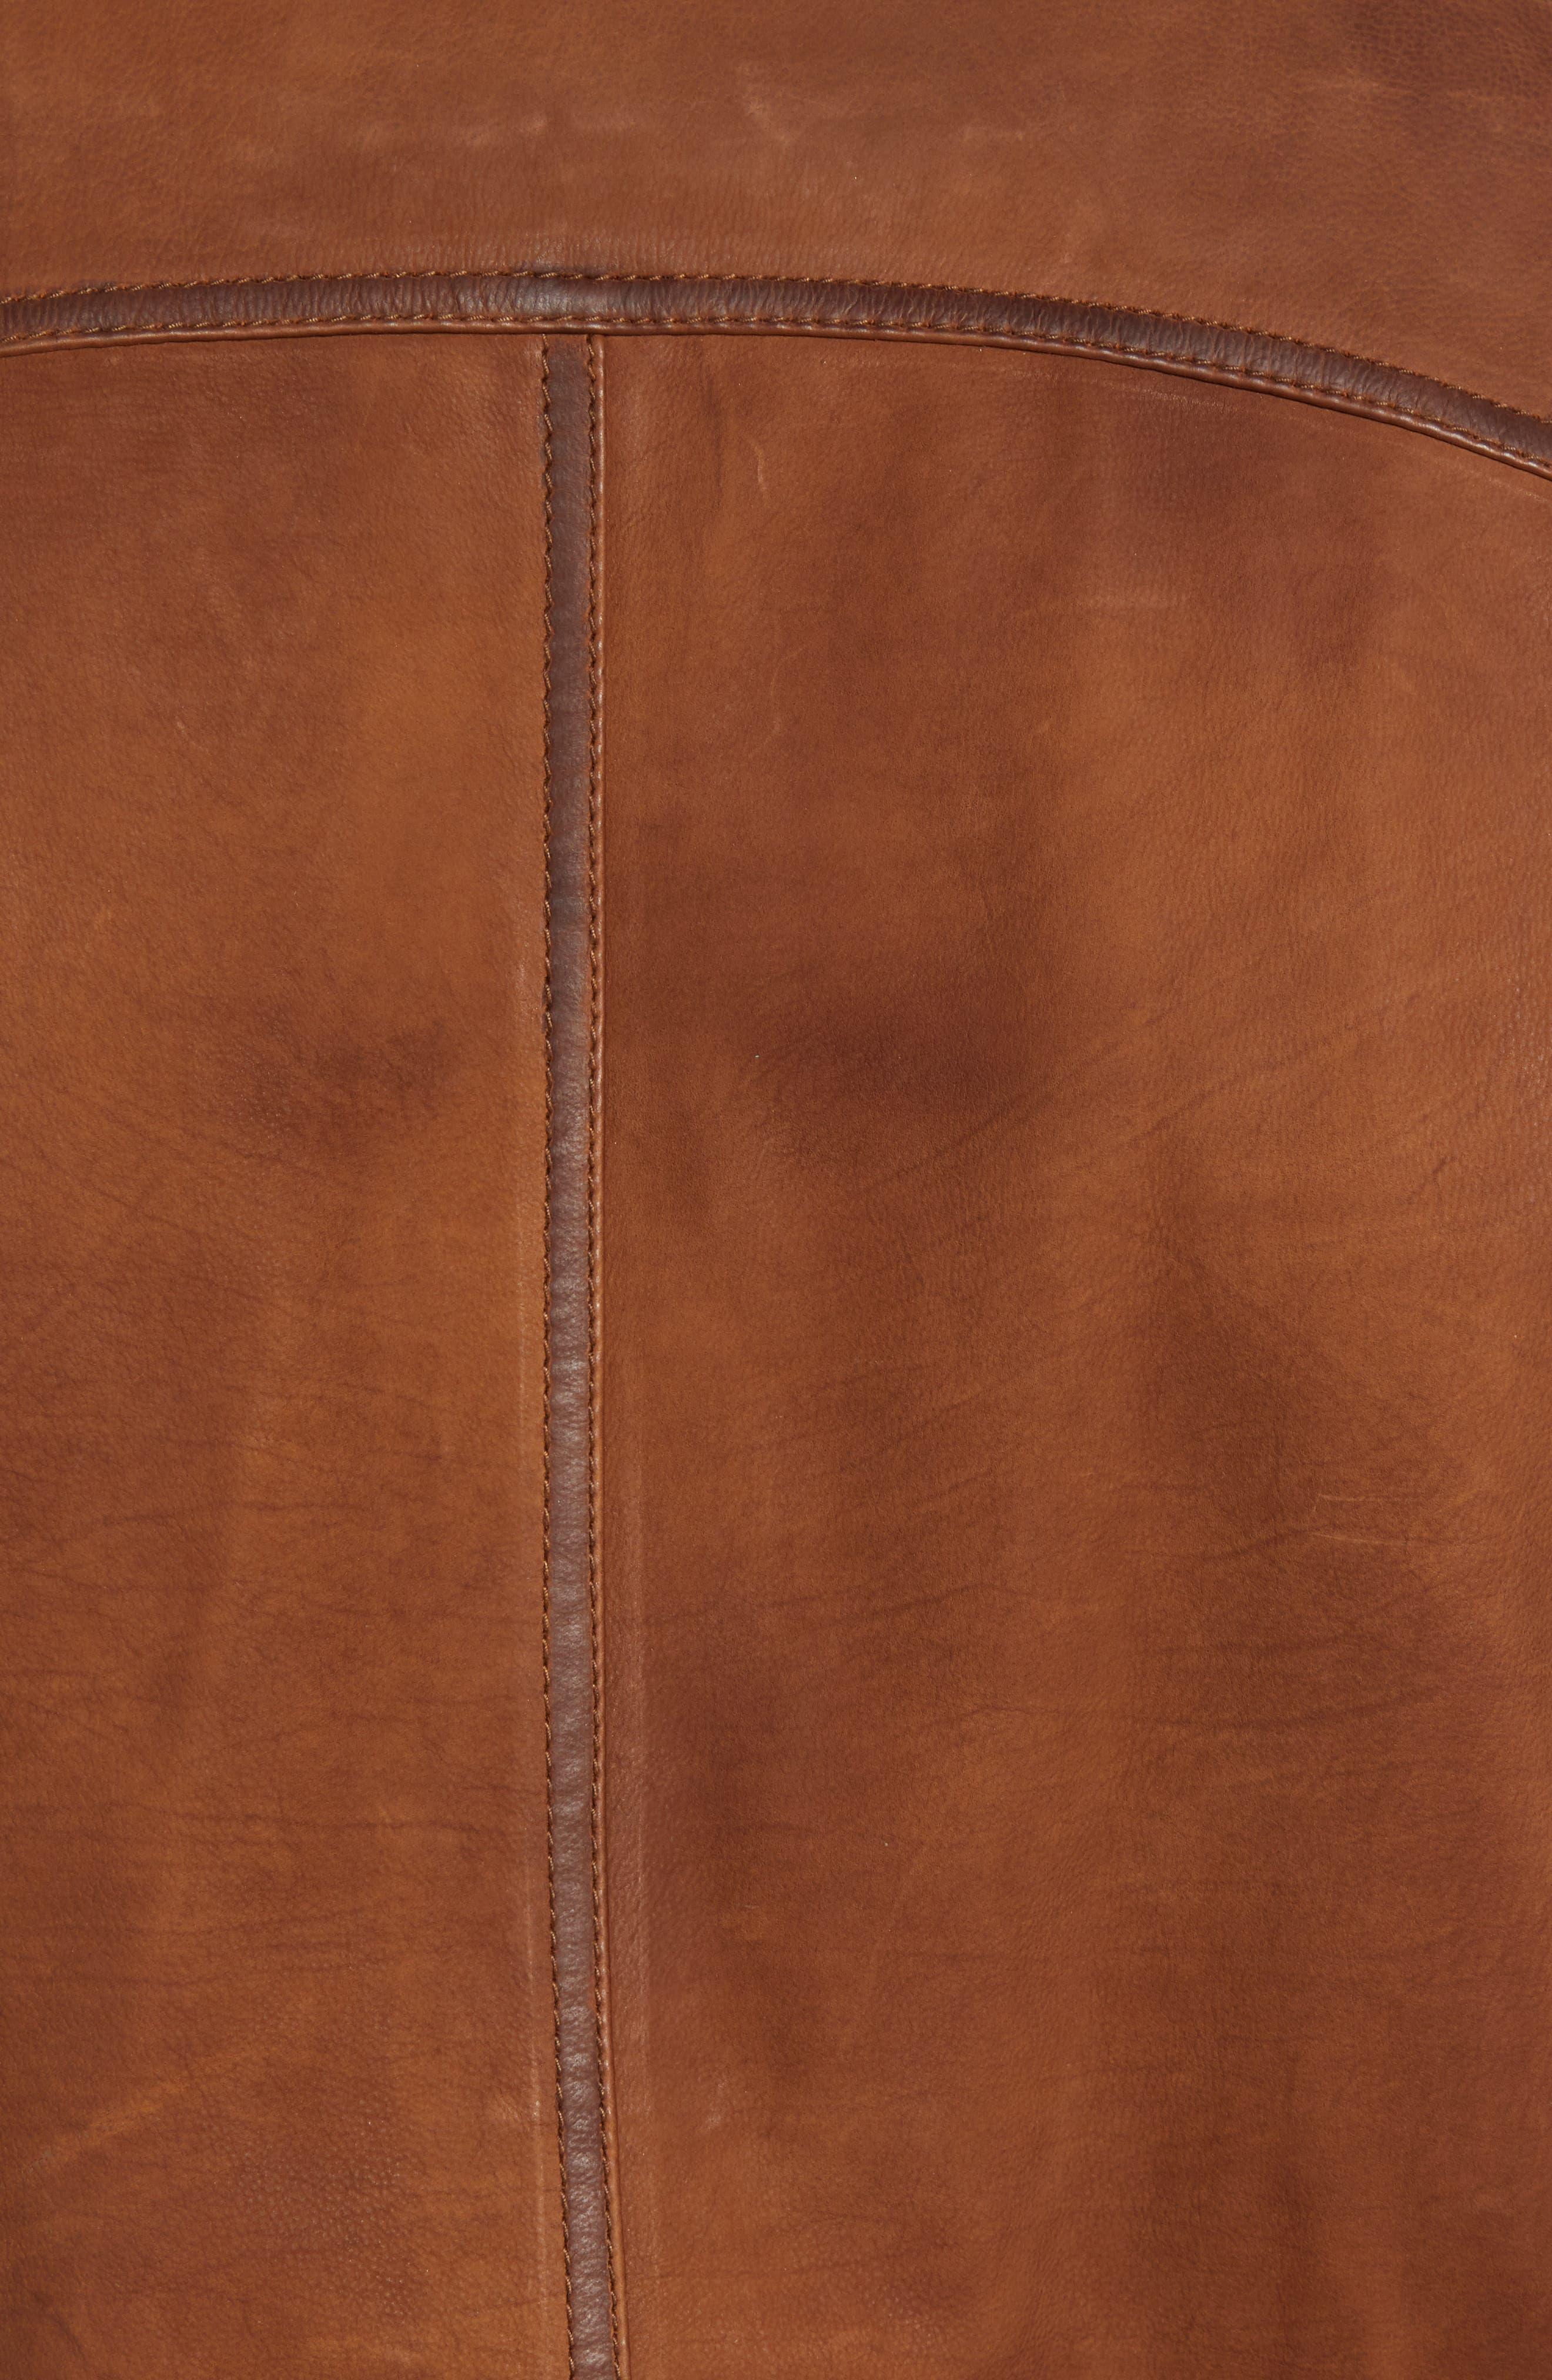 Regular Fit Leather Moto Jacket,                             Alternate thumbnail 7, color,                             COGNAC